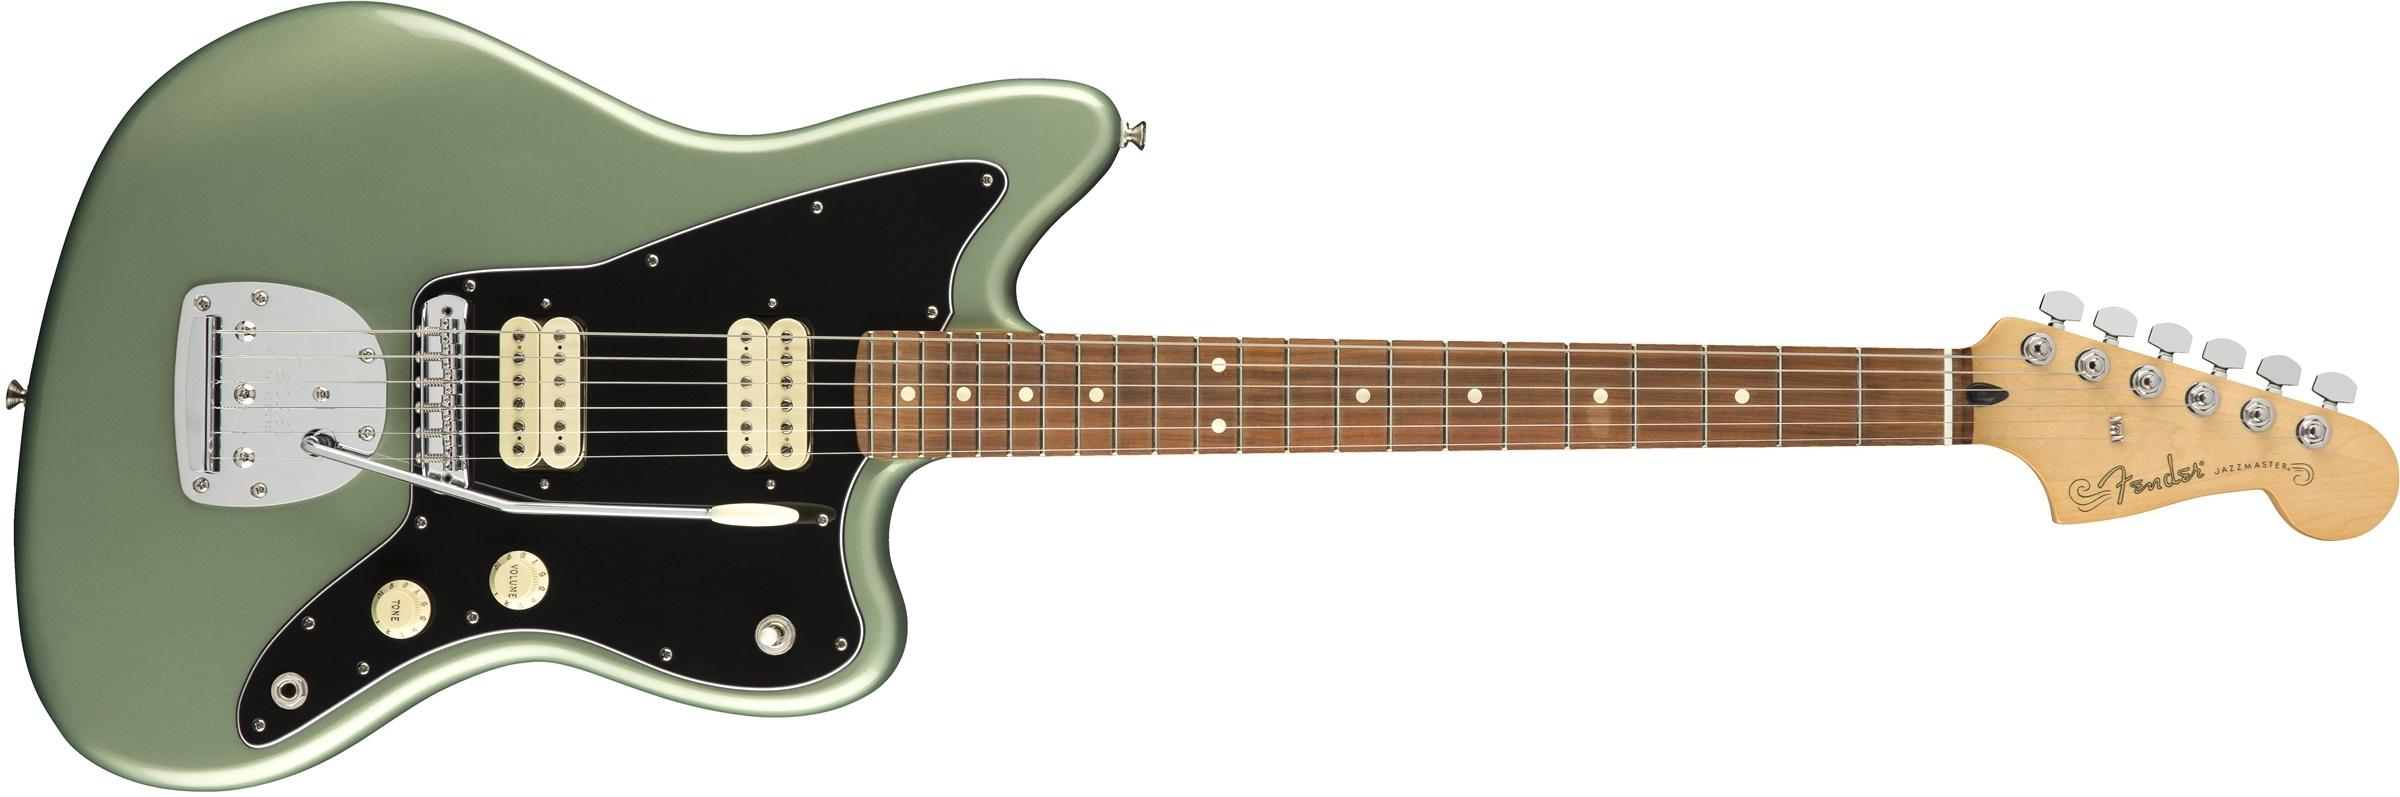 Fender Player Jazzmaster PF SGM